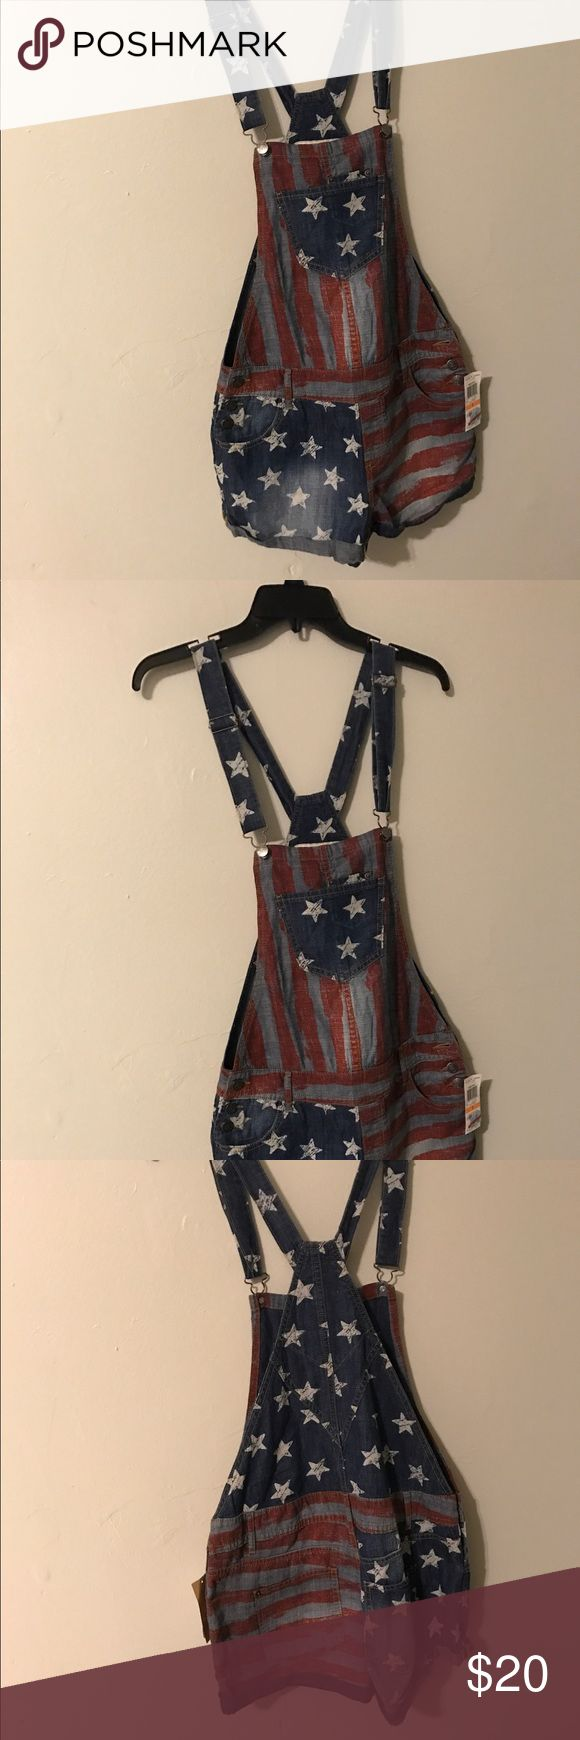 American rag women's romper American rag women's romper. New with tags. American Rag Other